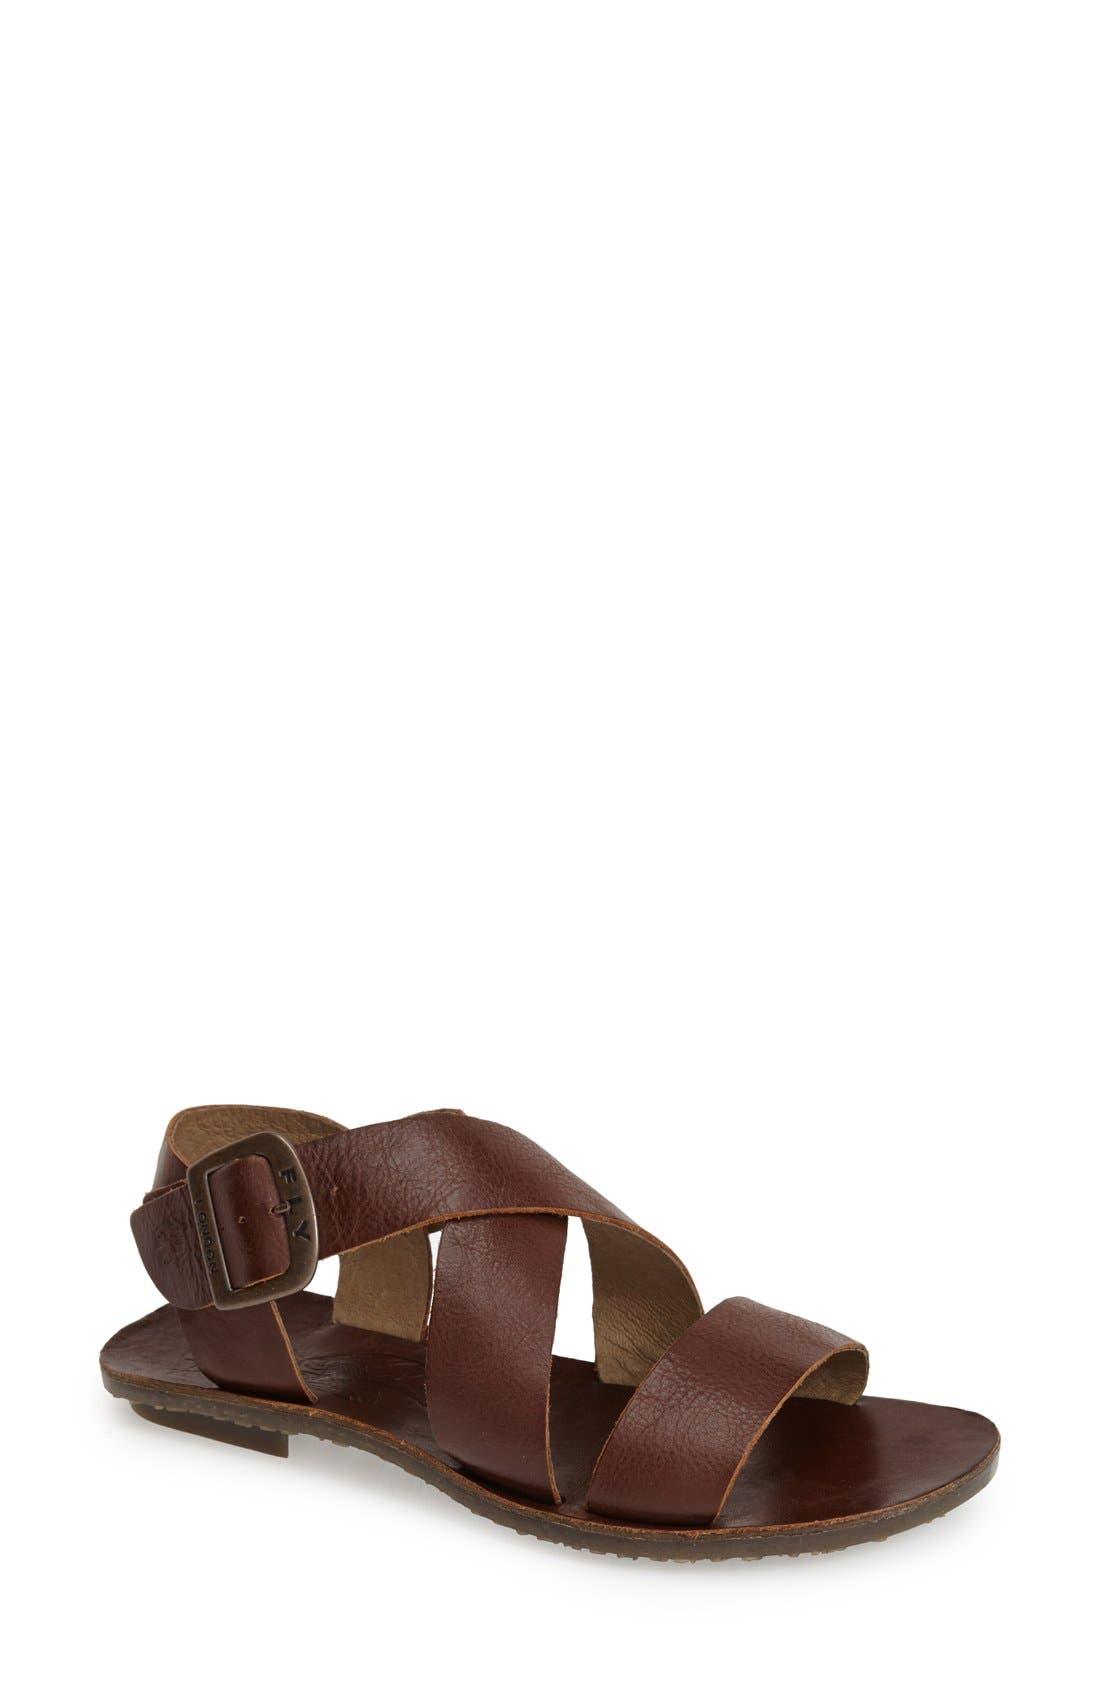 Main Image - Fly London 'Bian' Flat Leather Sandal (Women)